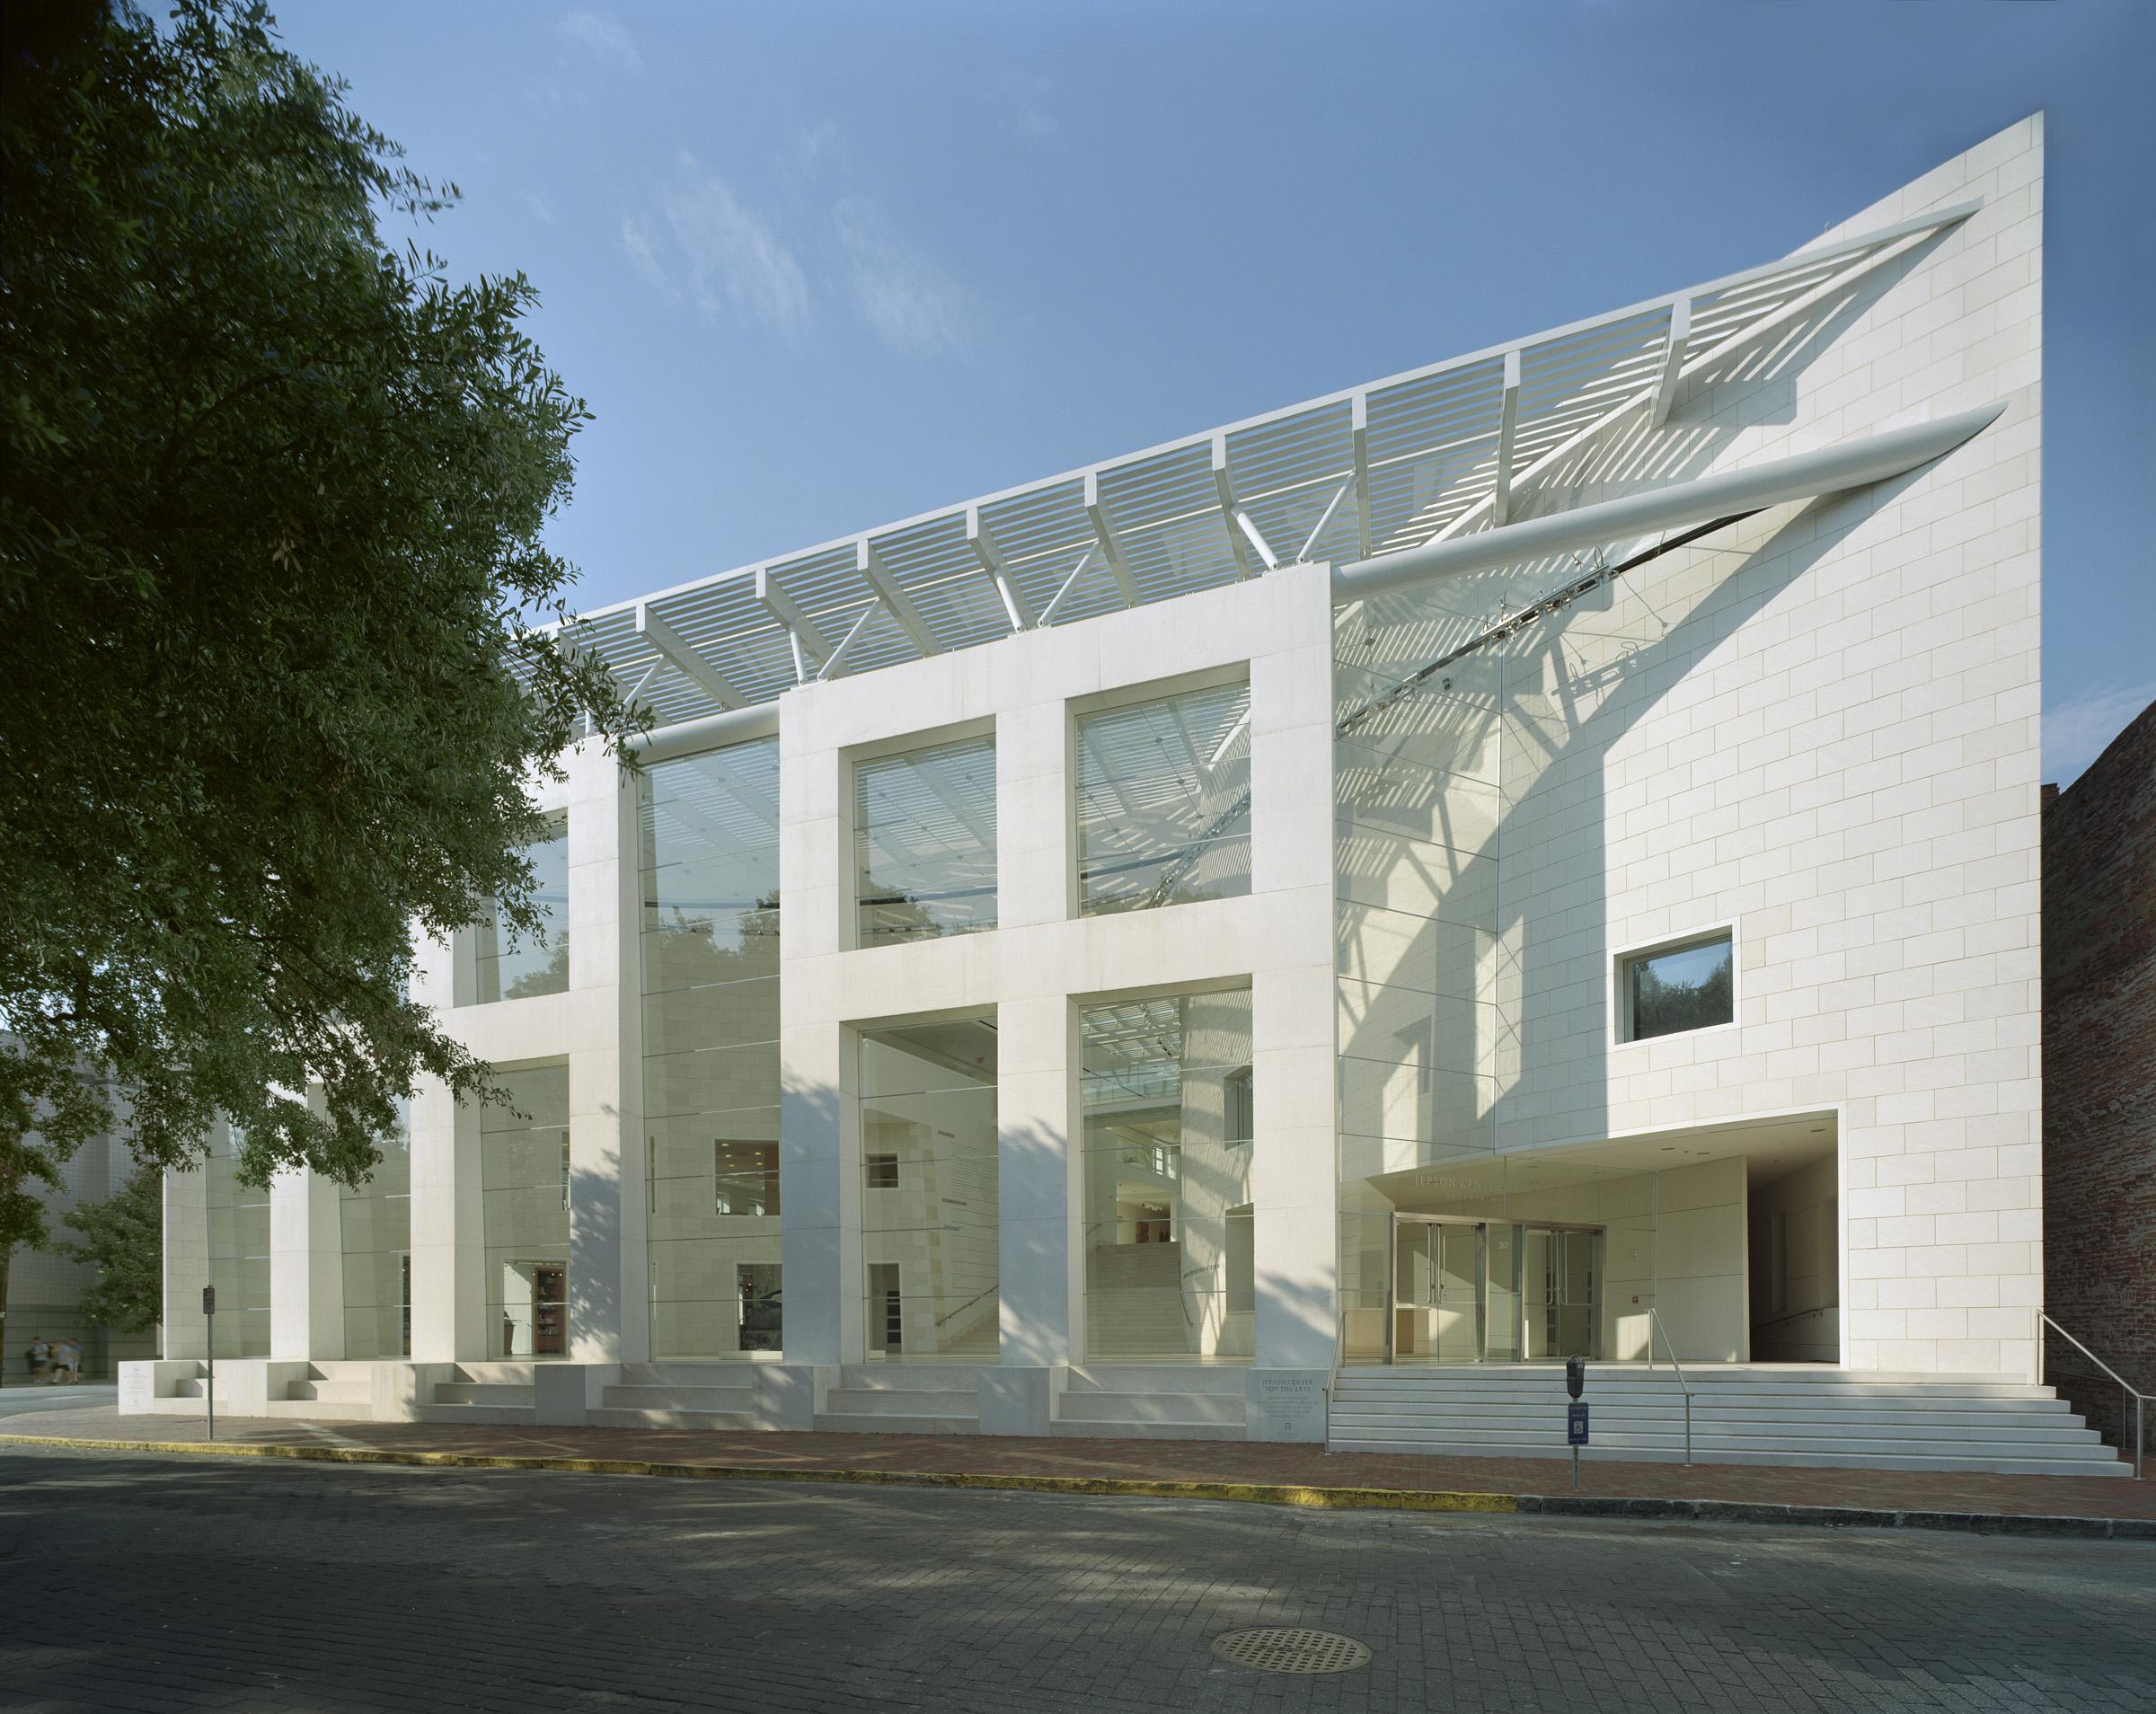 Jepson Center